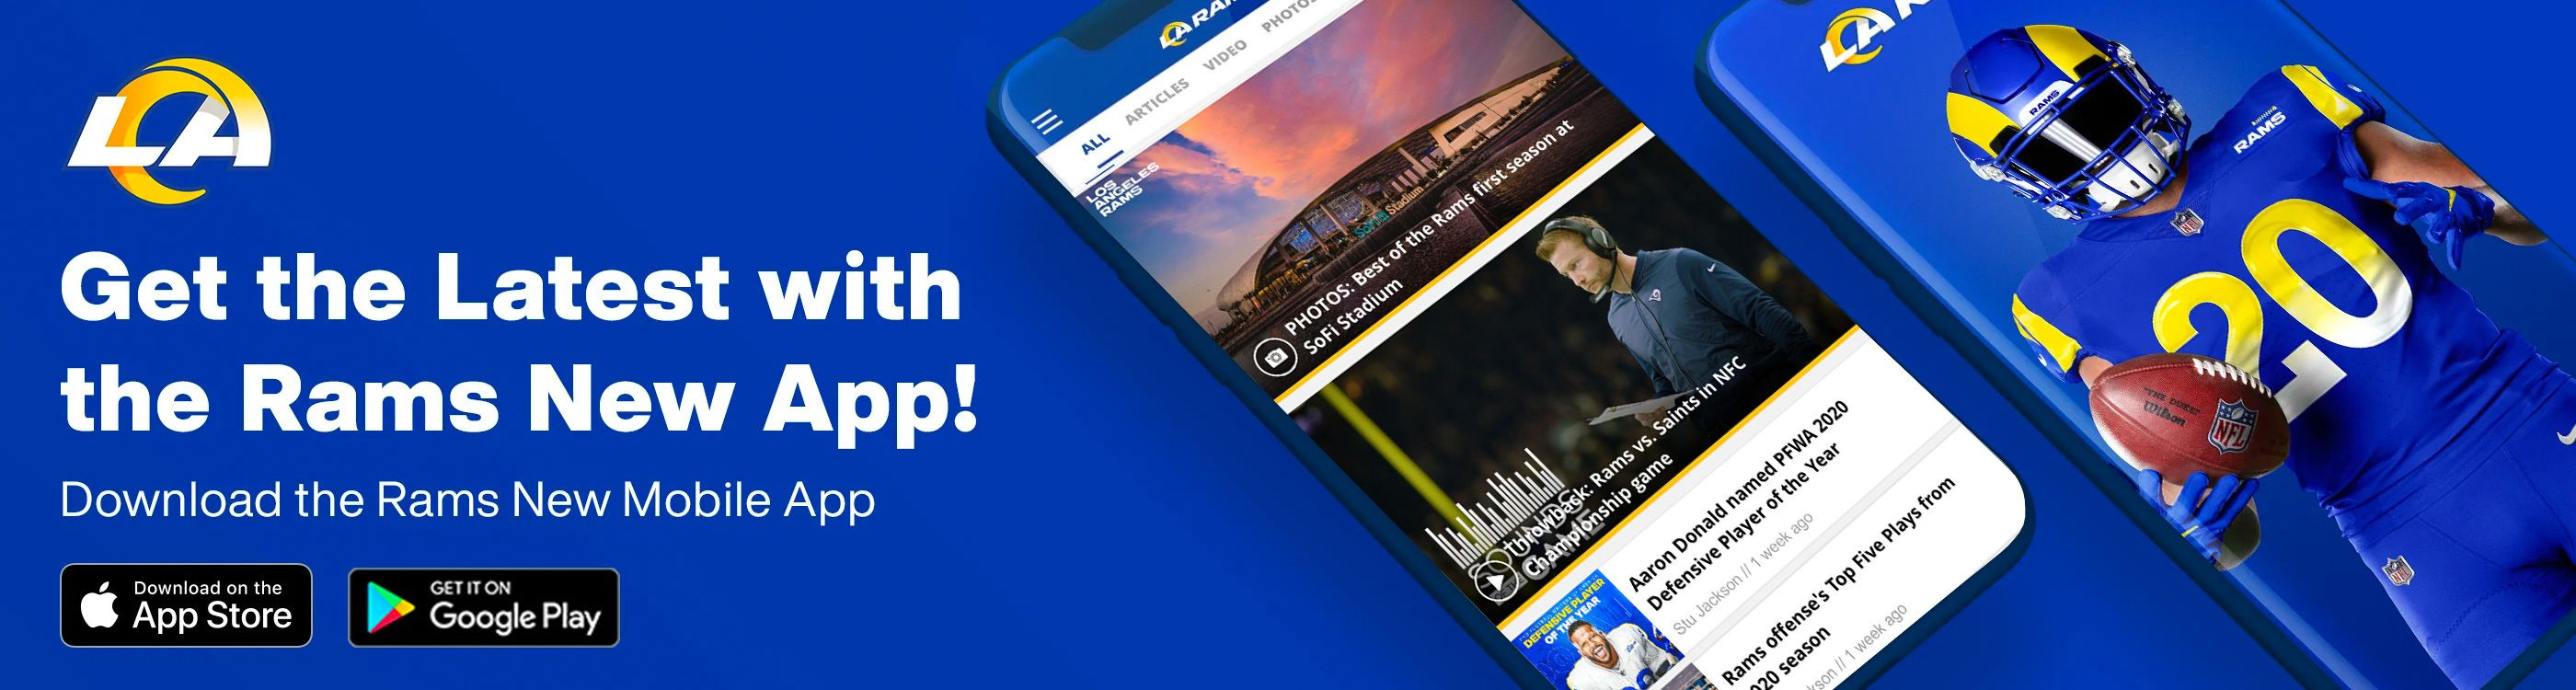 2021-app-promo-banner